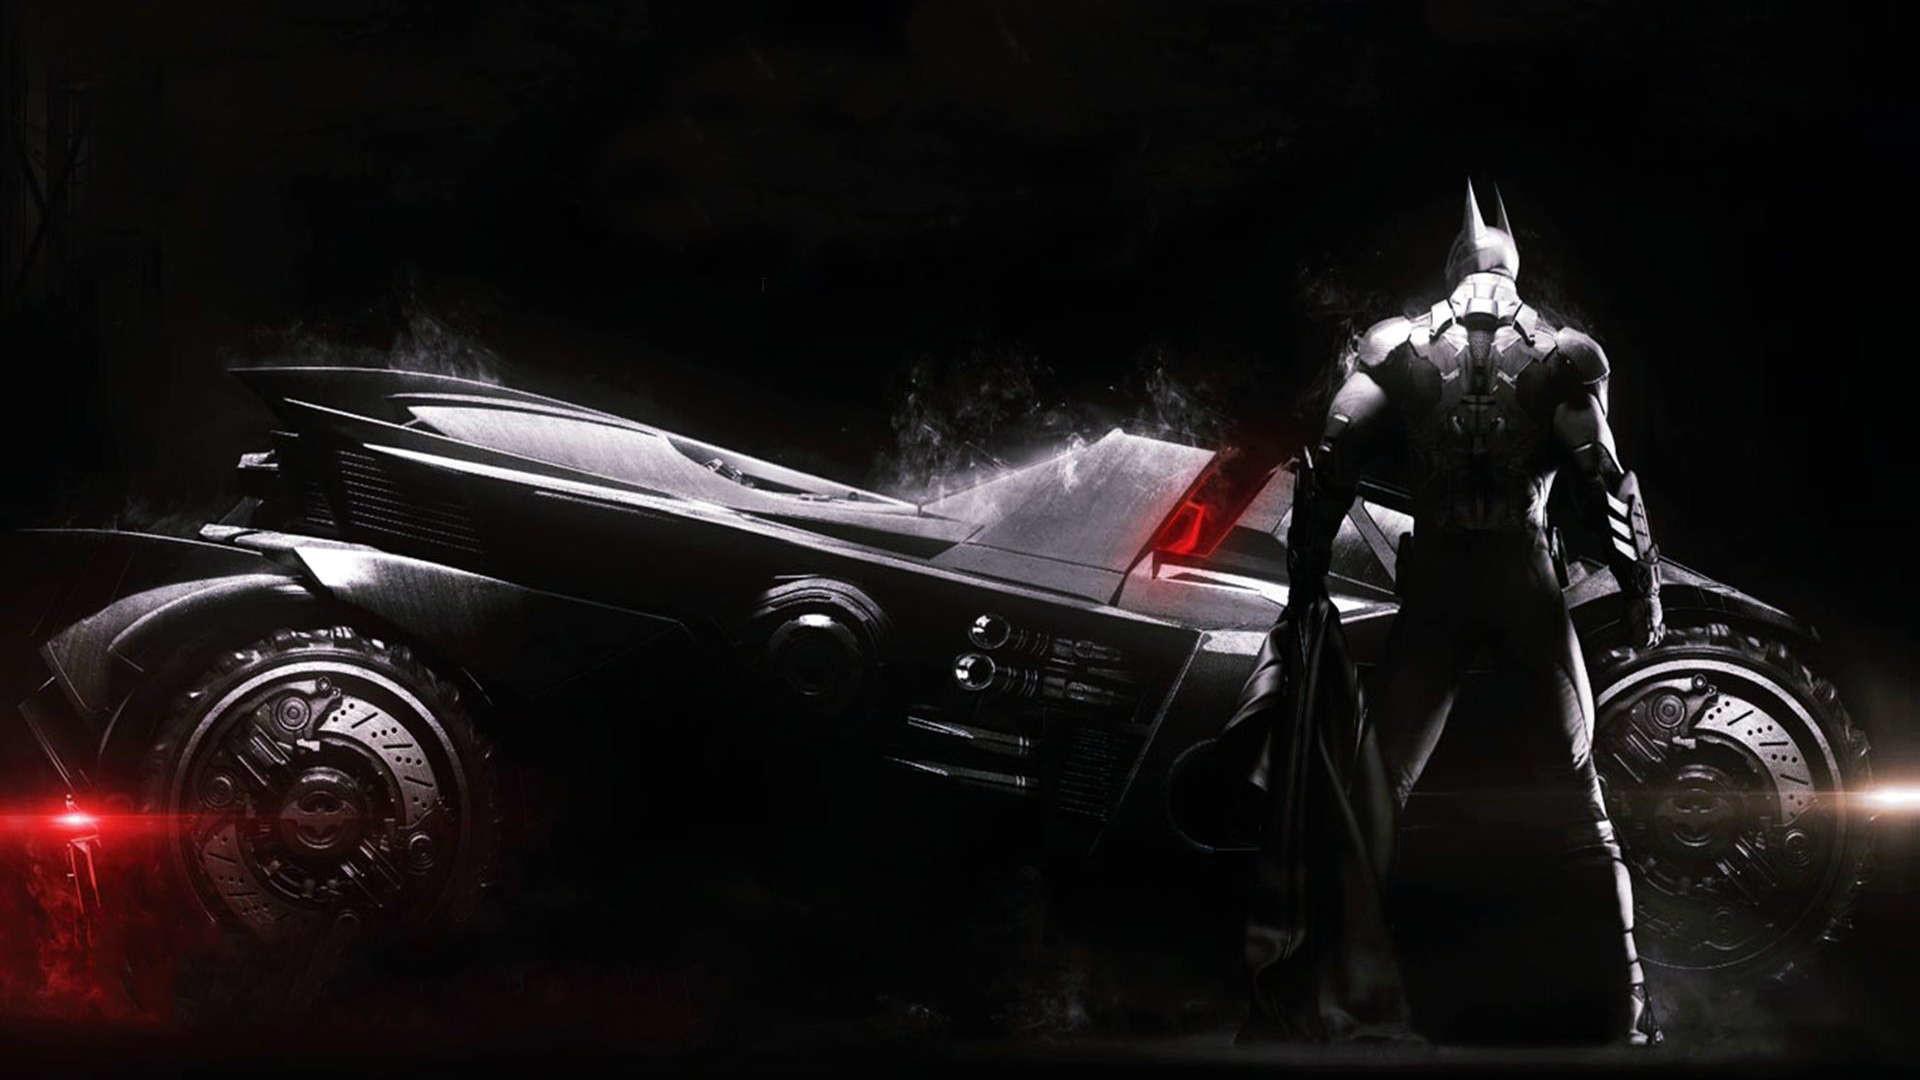 Download free Batman vs Superman Wallpapers HD.